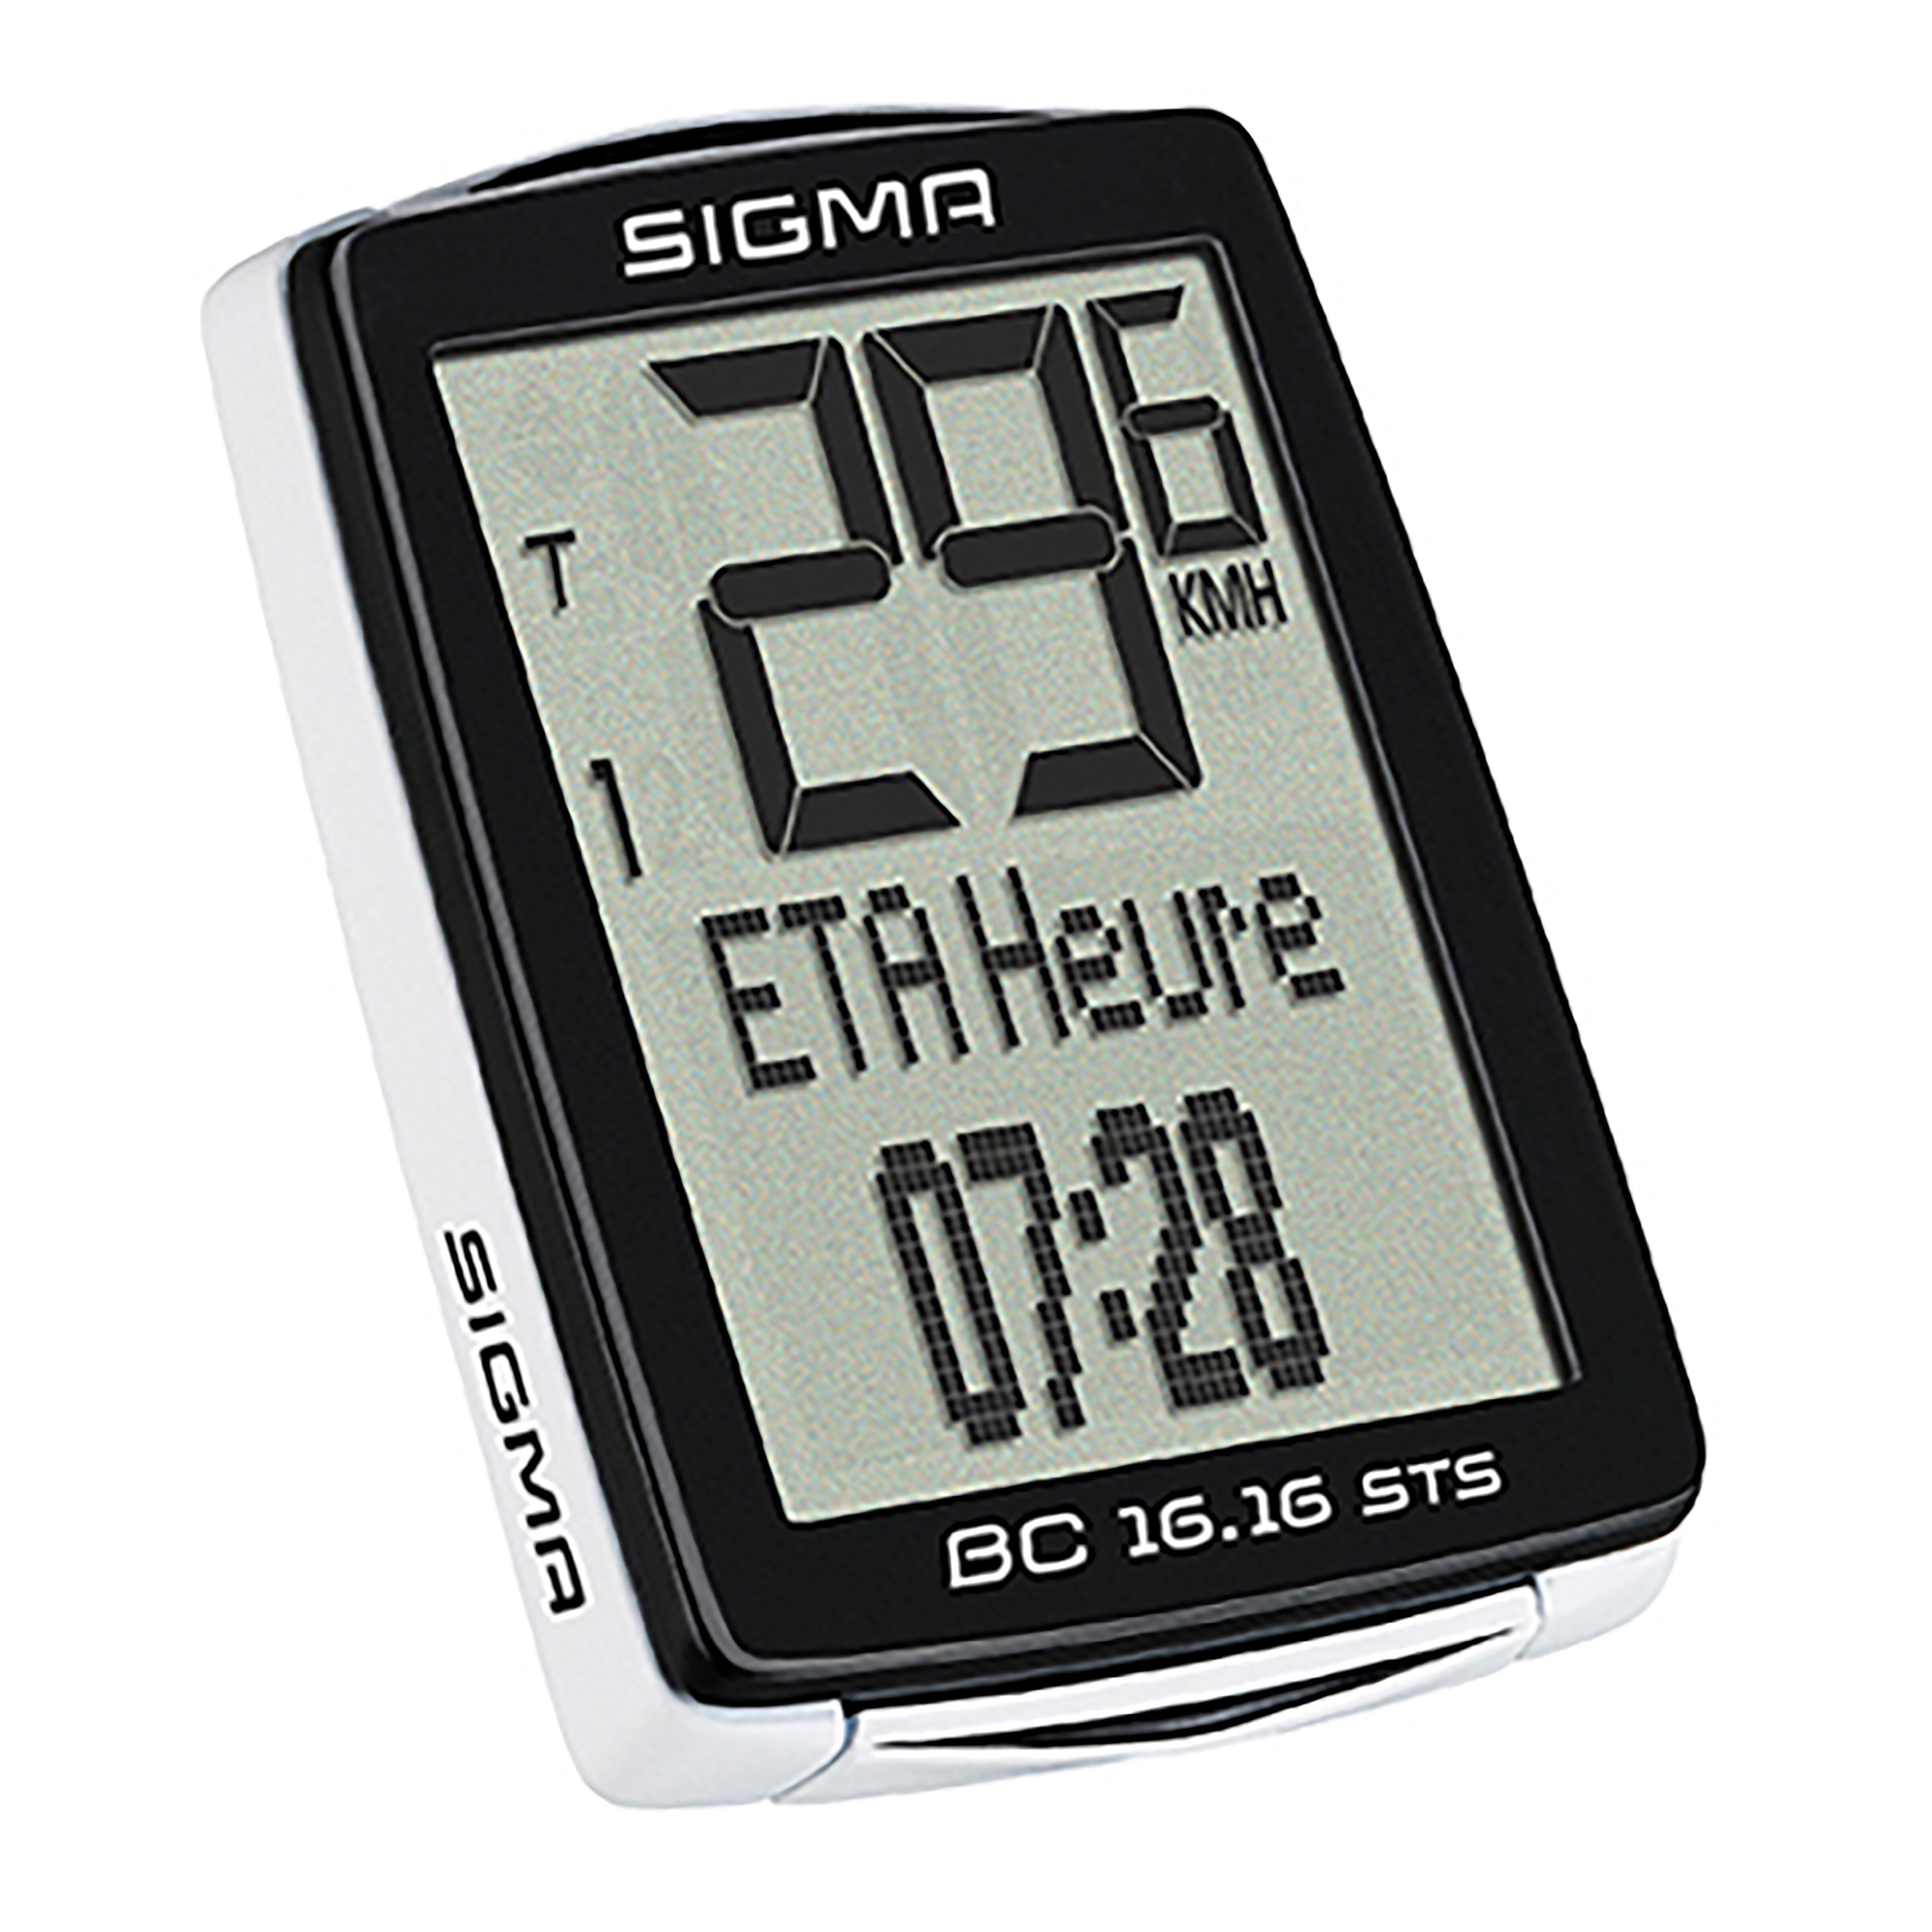 Sigma Sport BC 16.16 STS fietscomputer